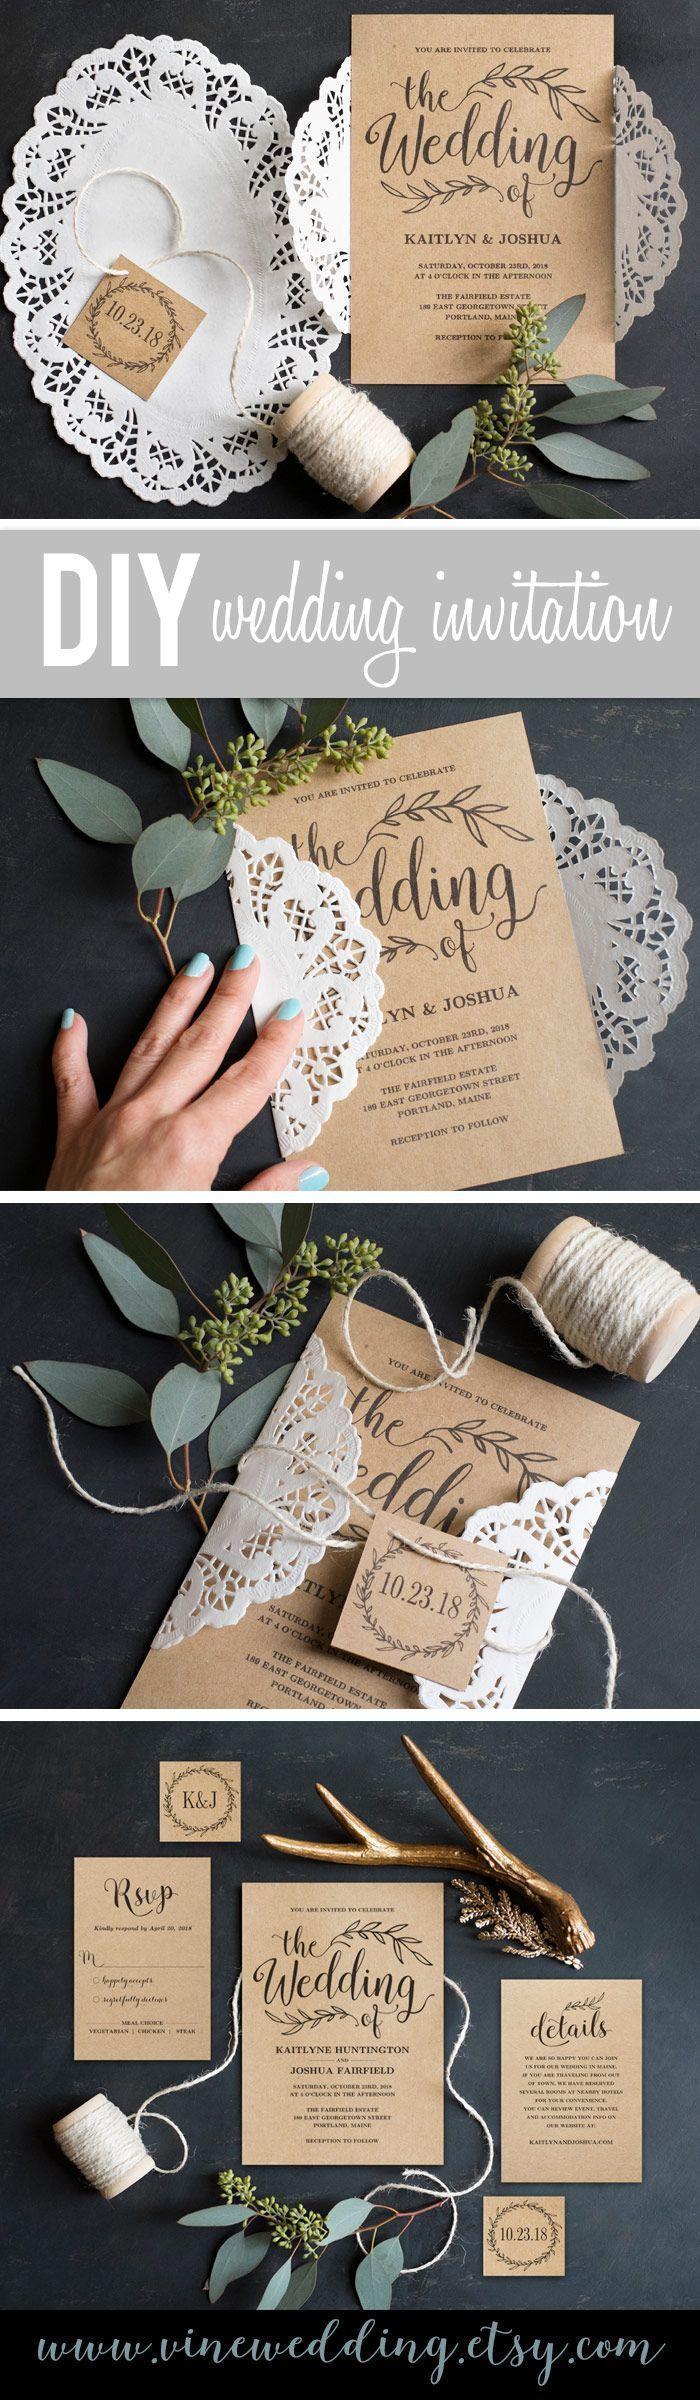 wedding invitation printing malaysia%0A    Easy to Make Wedding Invitation Ideas   Wedding card  Card ideas and Diy  winter weddings